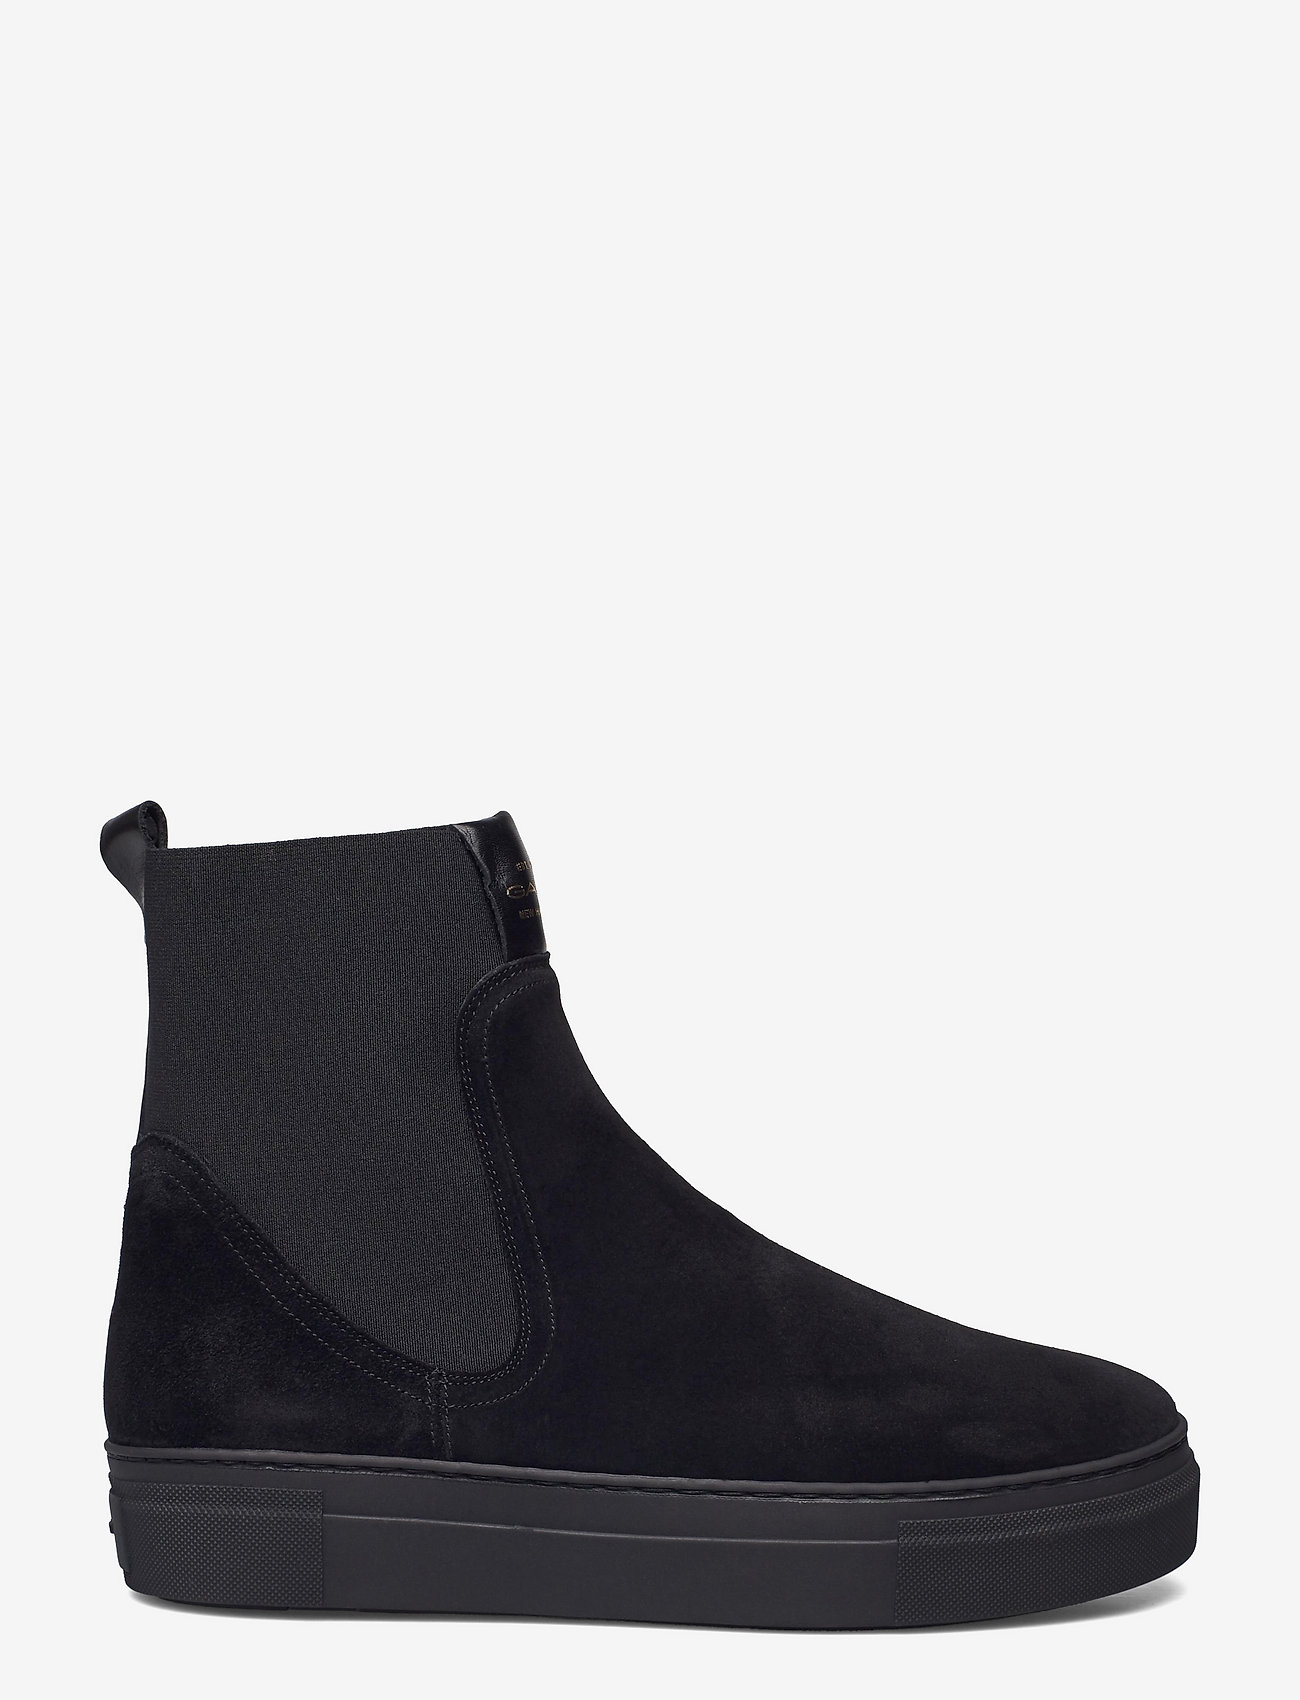 GANT - Vanna Chelsea - chelsea boots - black - 1